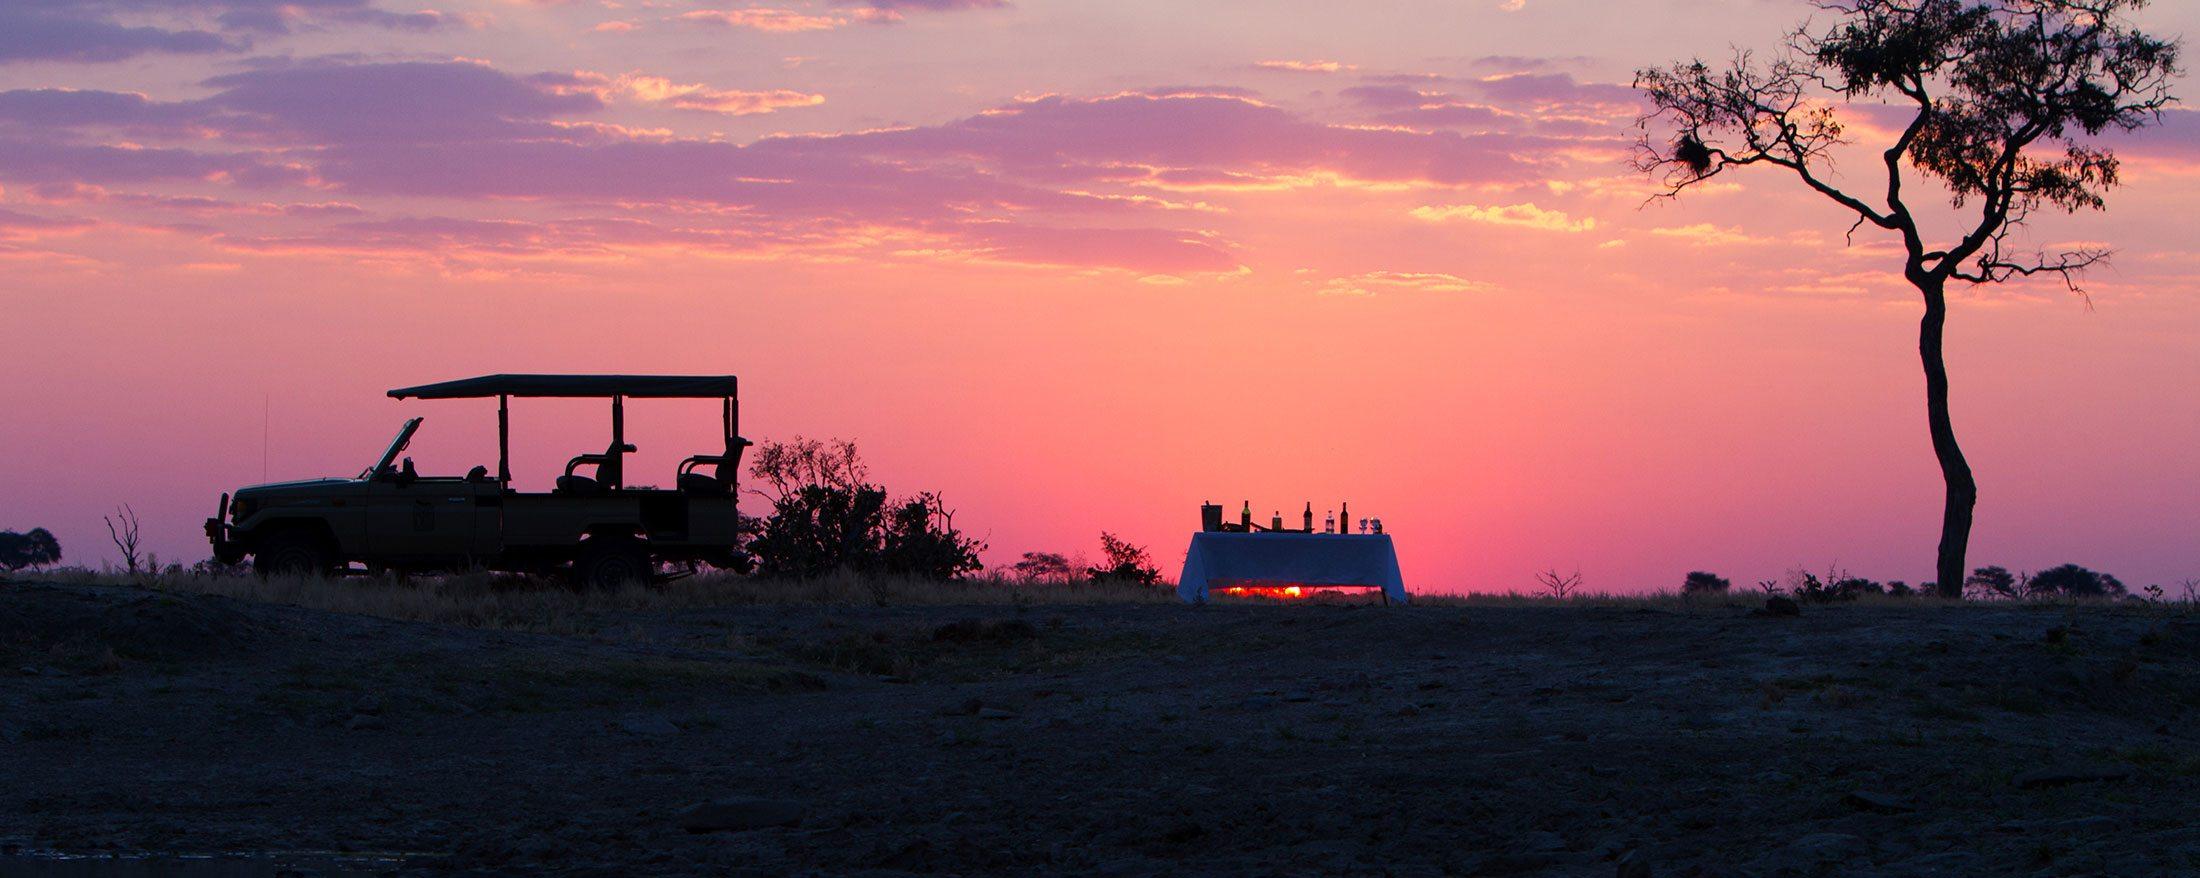 Having bush sundowners is a wonderful way to end your day at Savute Safari Lodge.